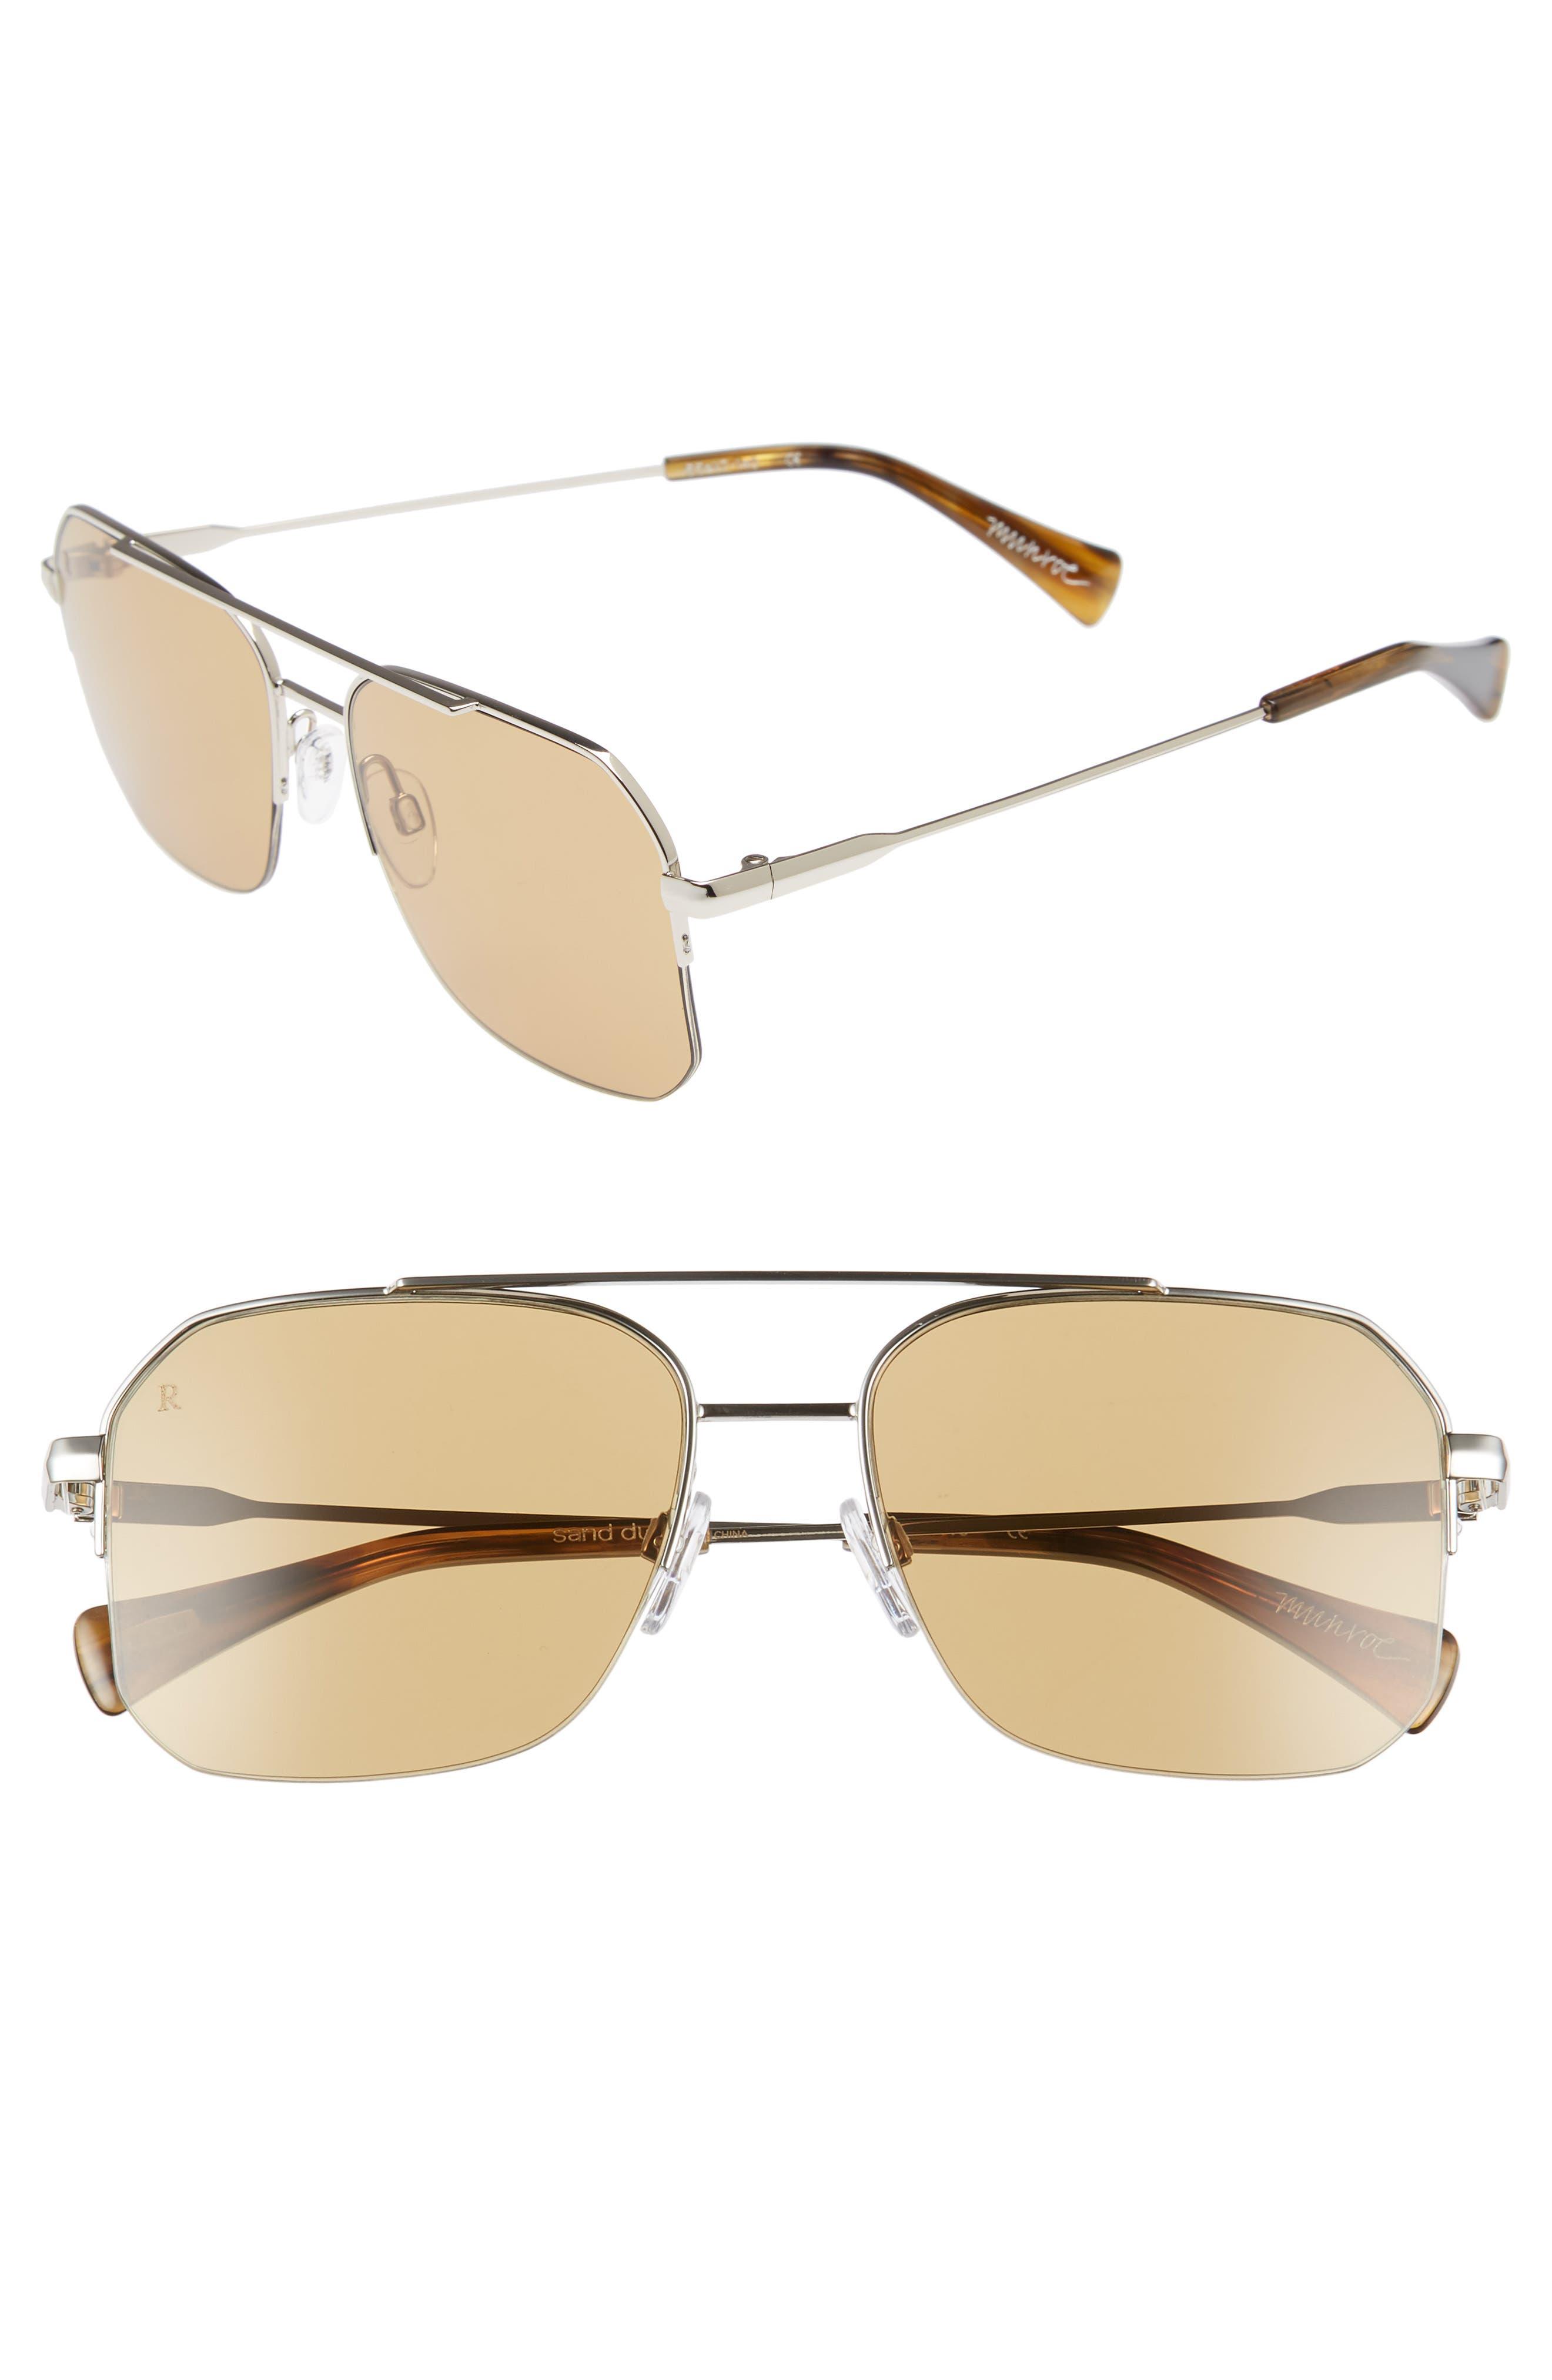 RAEN Munroe 55Mm Square Aviator Sunglasses - Sand Dune